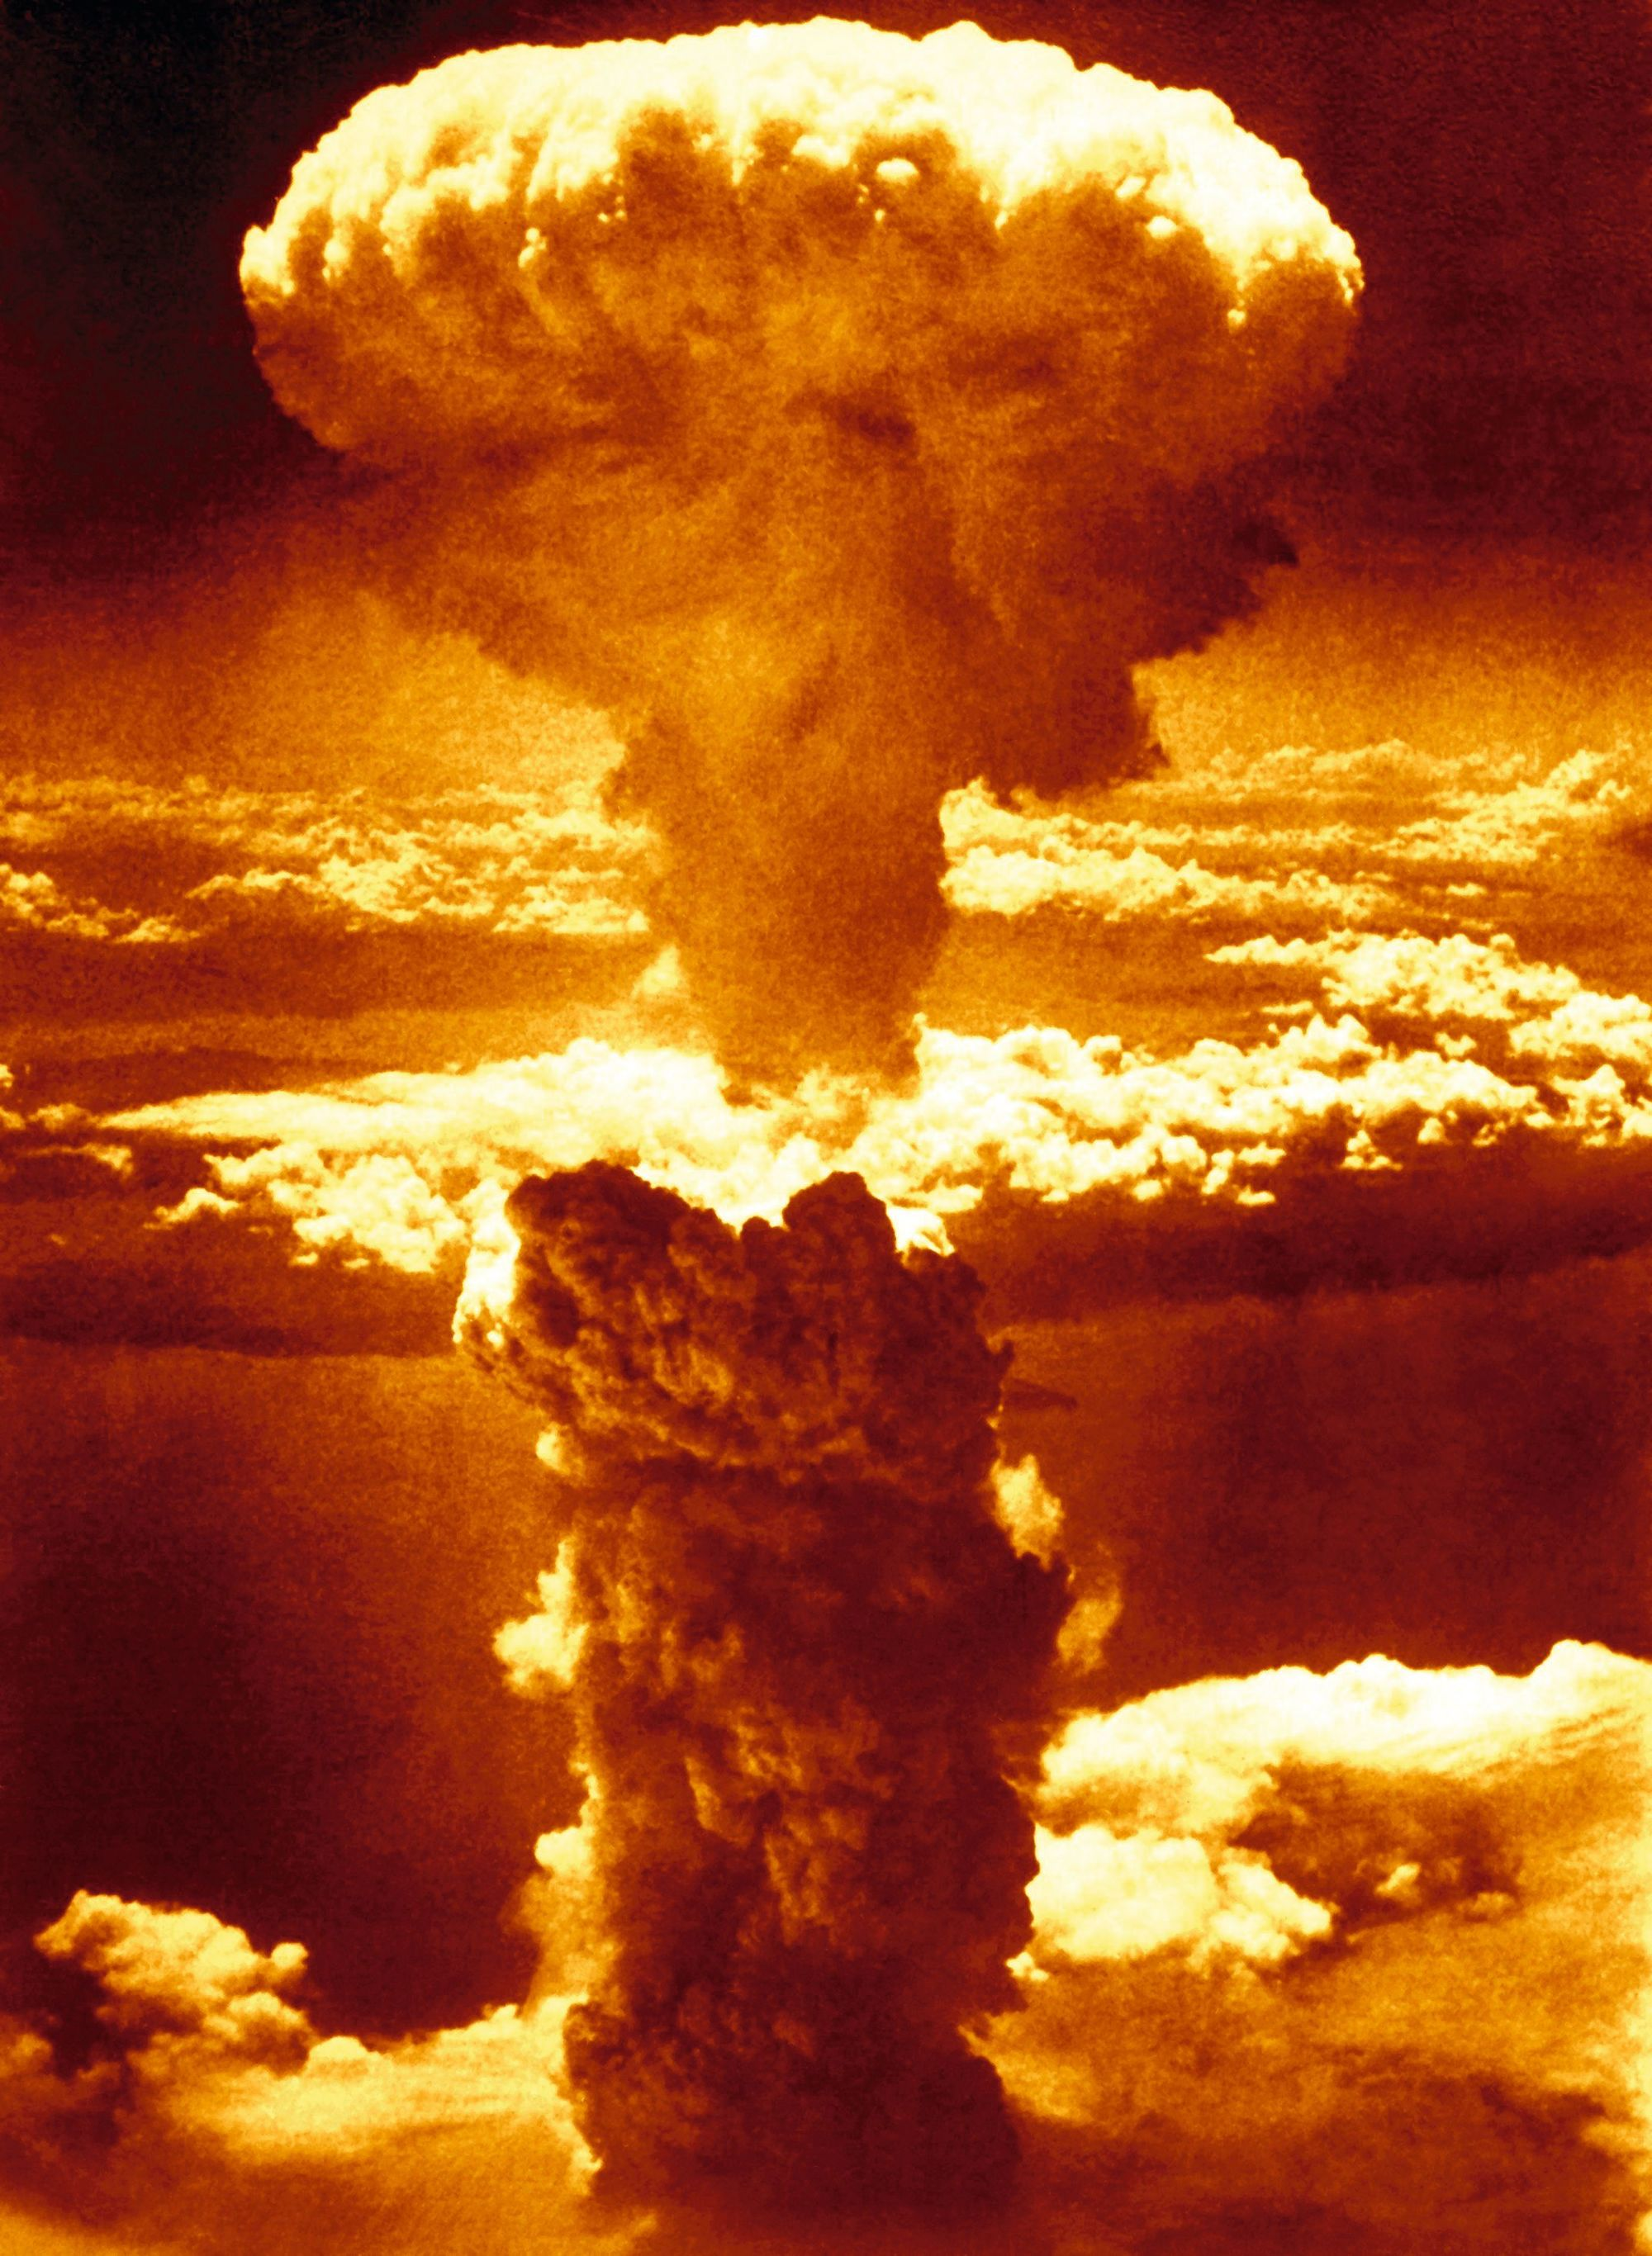 Contexte Chapitre 3 - Explosion atomique de Nagasaki 9 août 1945